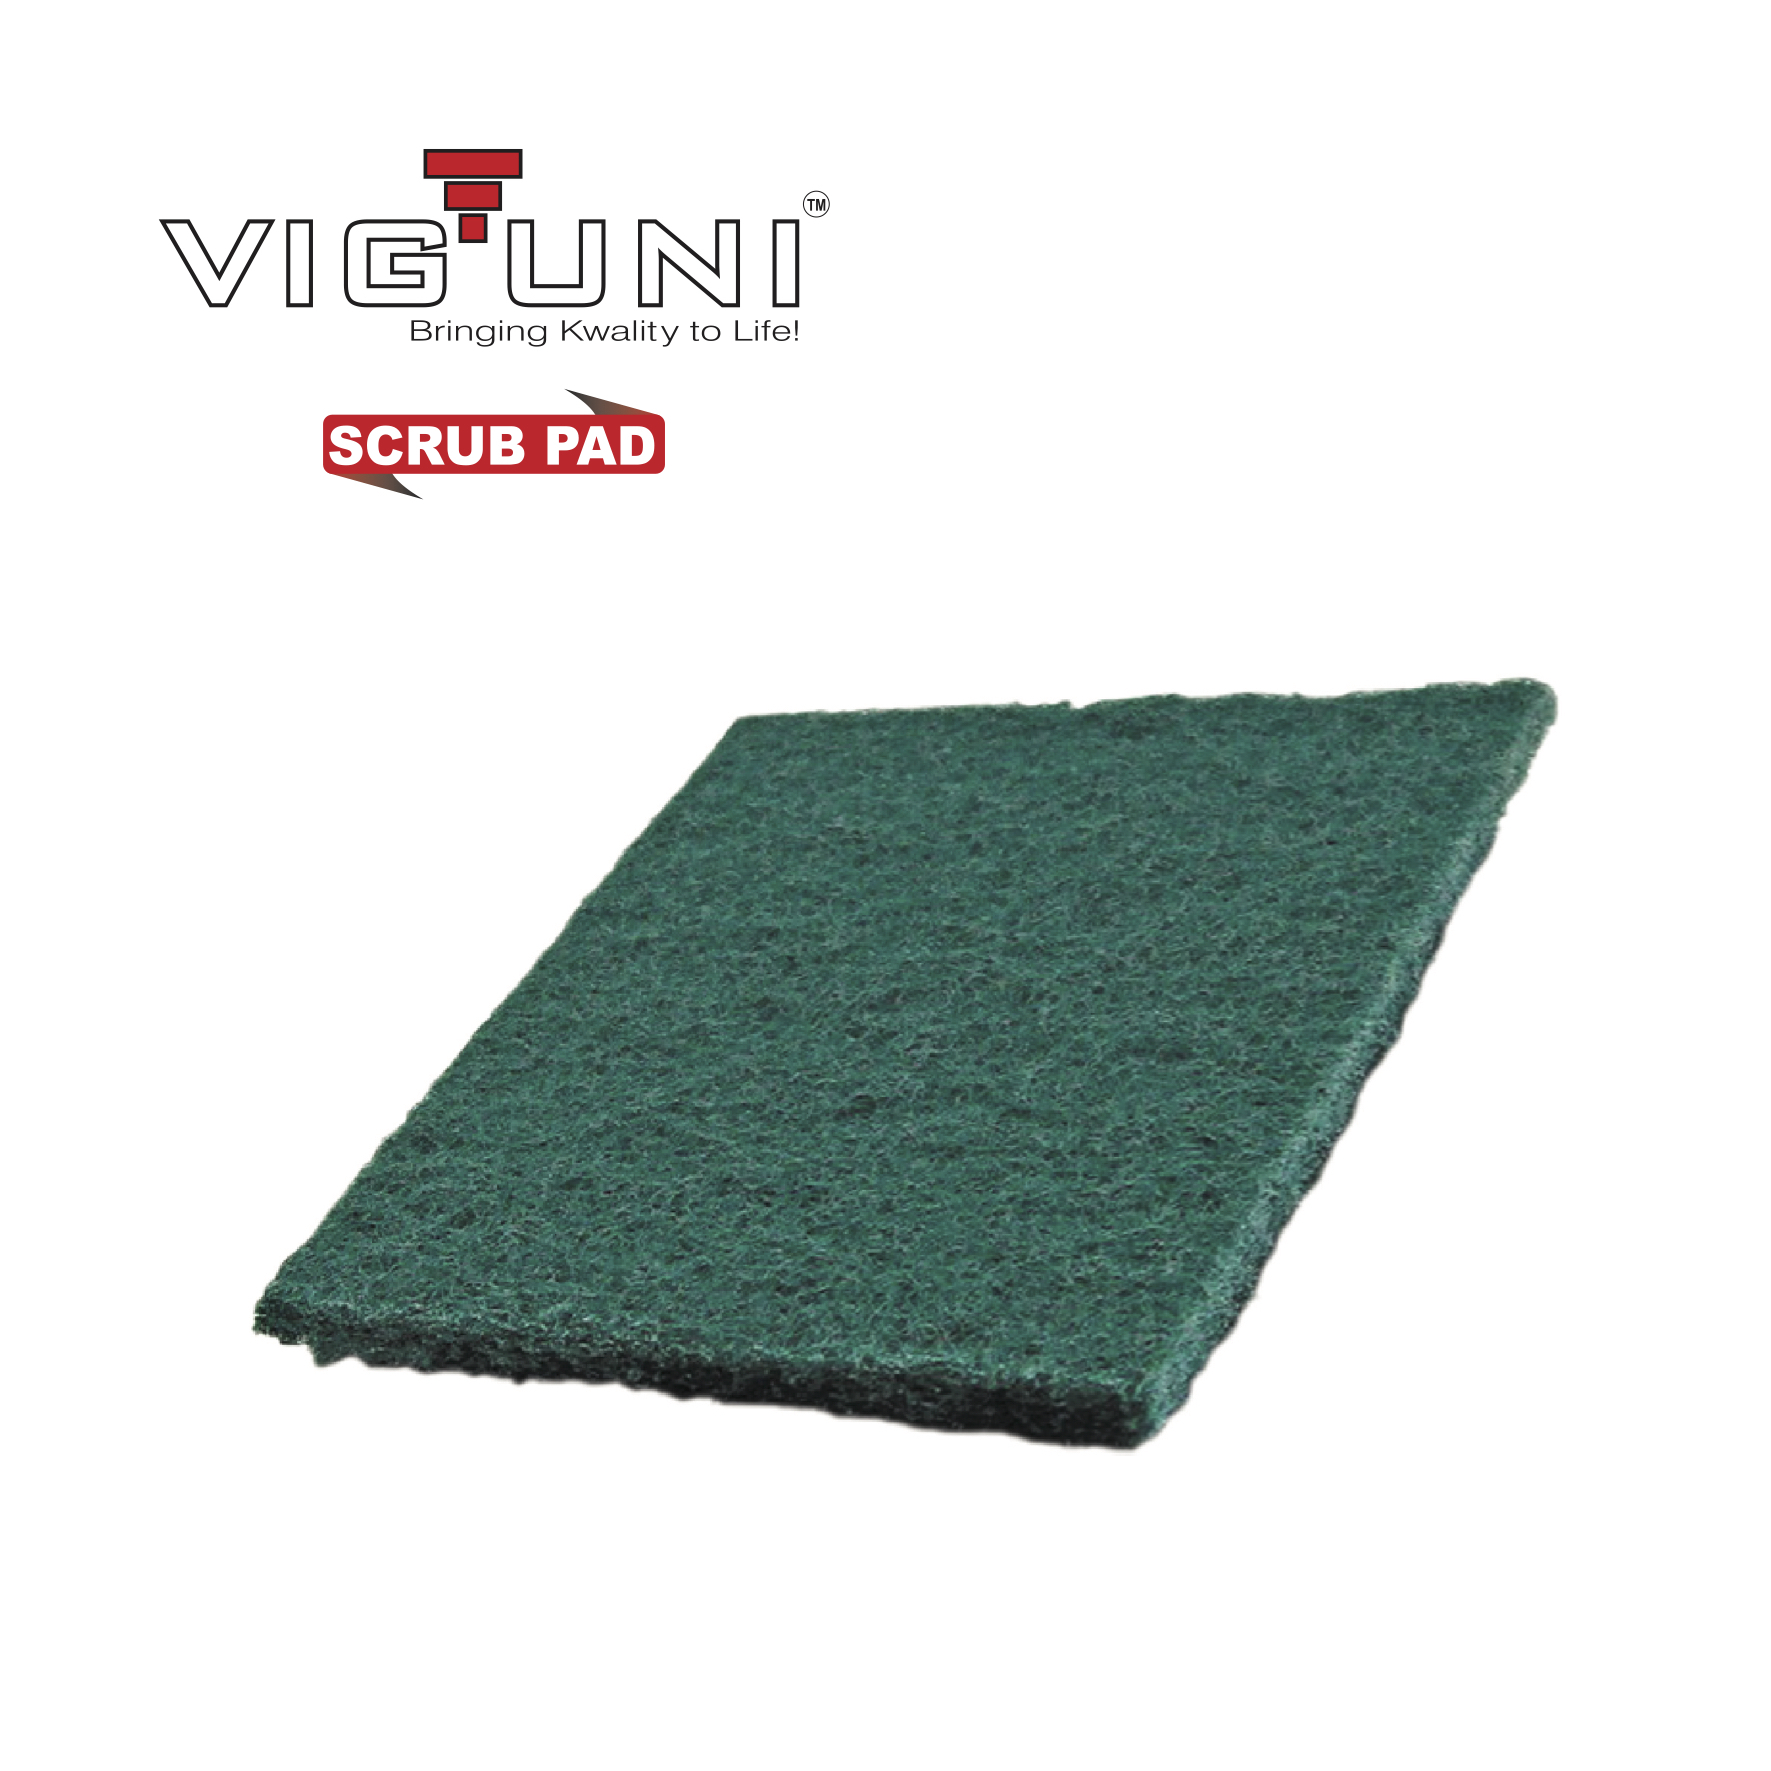 VIGUNI Scrub Pad (Nylon) - 3x4